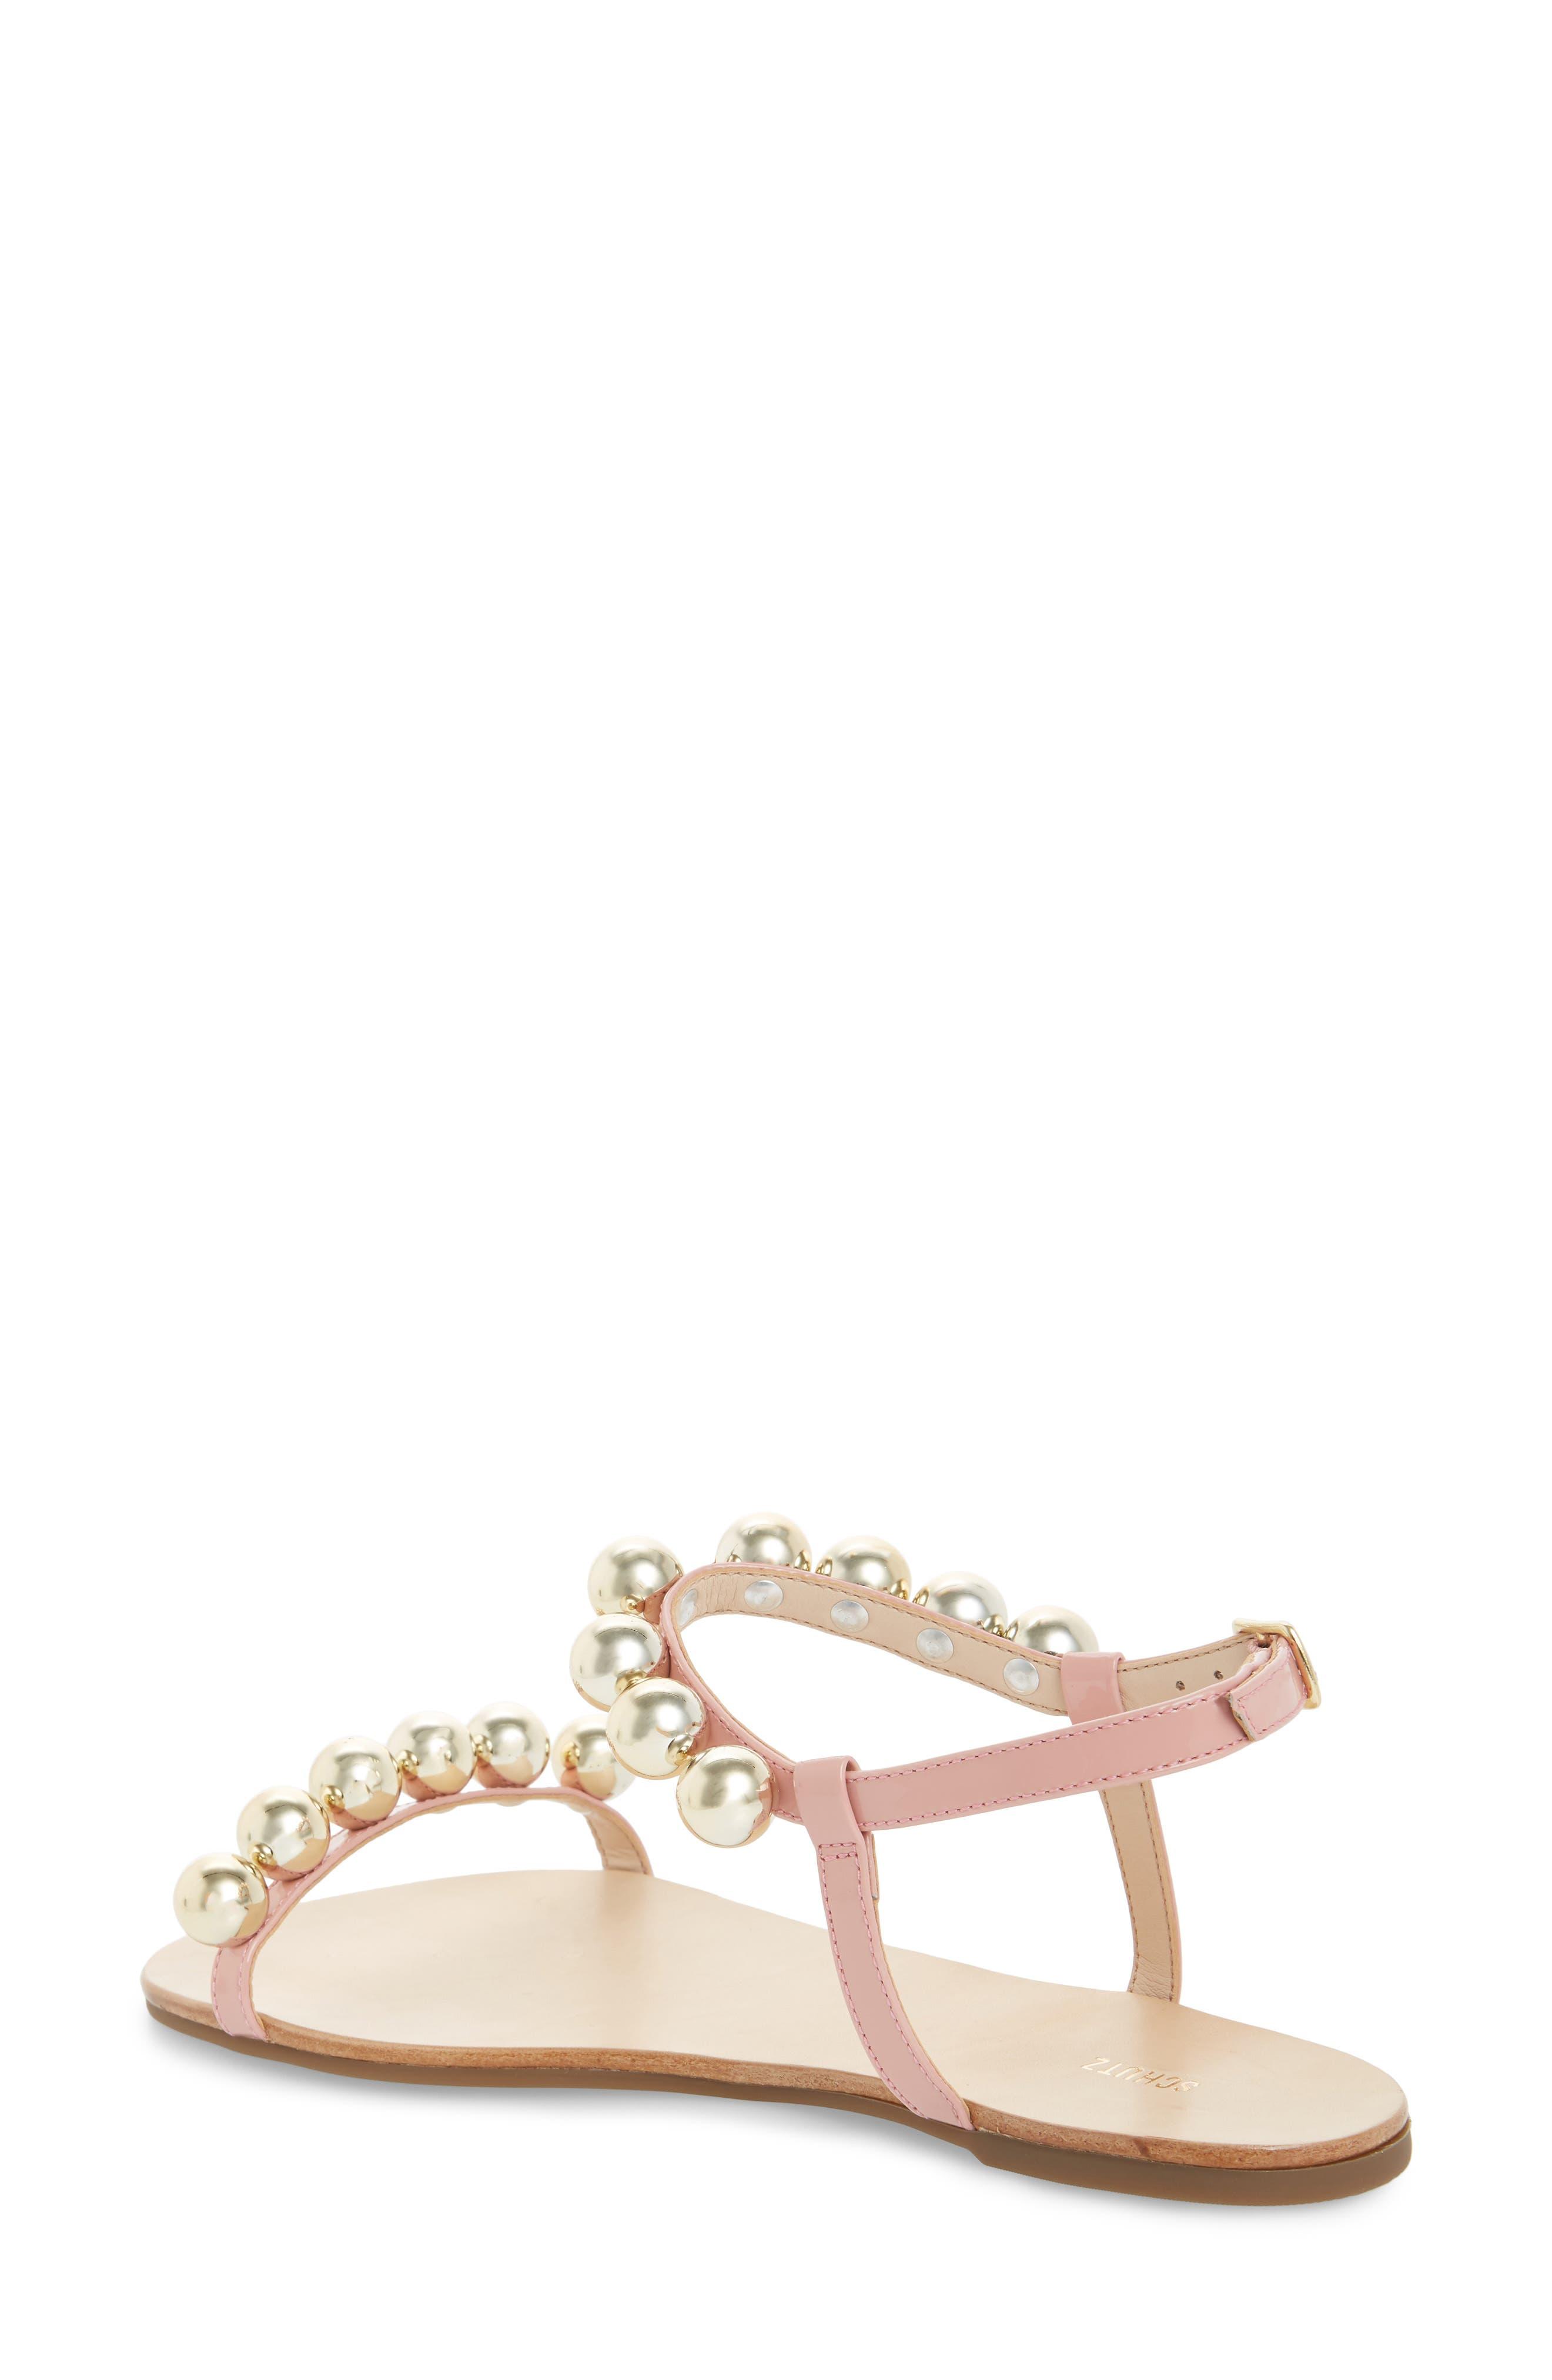 Hebe Ankle Strap Sandal,                             Alternate thumbnail 2, color,                             Poppy Rose Leather